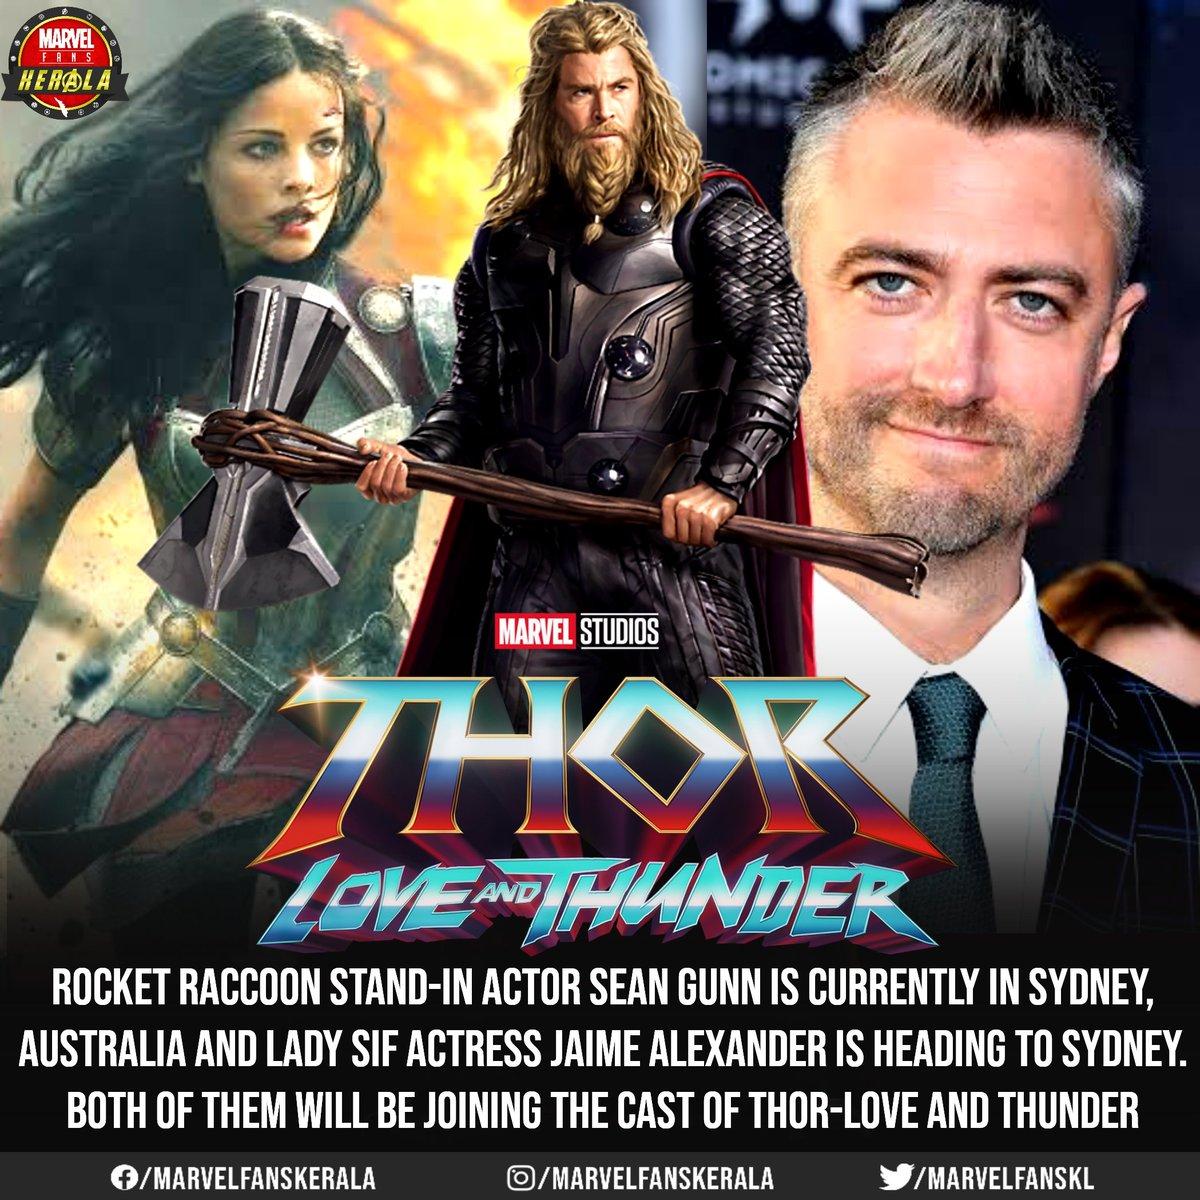 @seangunn and #JaimeAlexander joins Thor-Love and thunder cast.. No news on @zoesaldana's Gamora yet..  #MarvelFansKerala #ThorLoveAndThunder #marvel #chrishemsworth